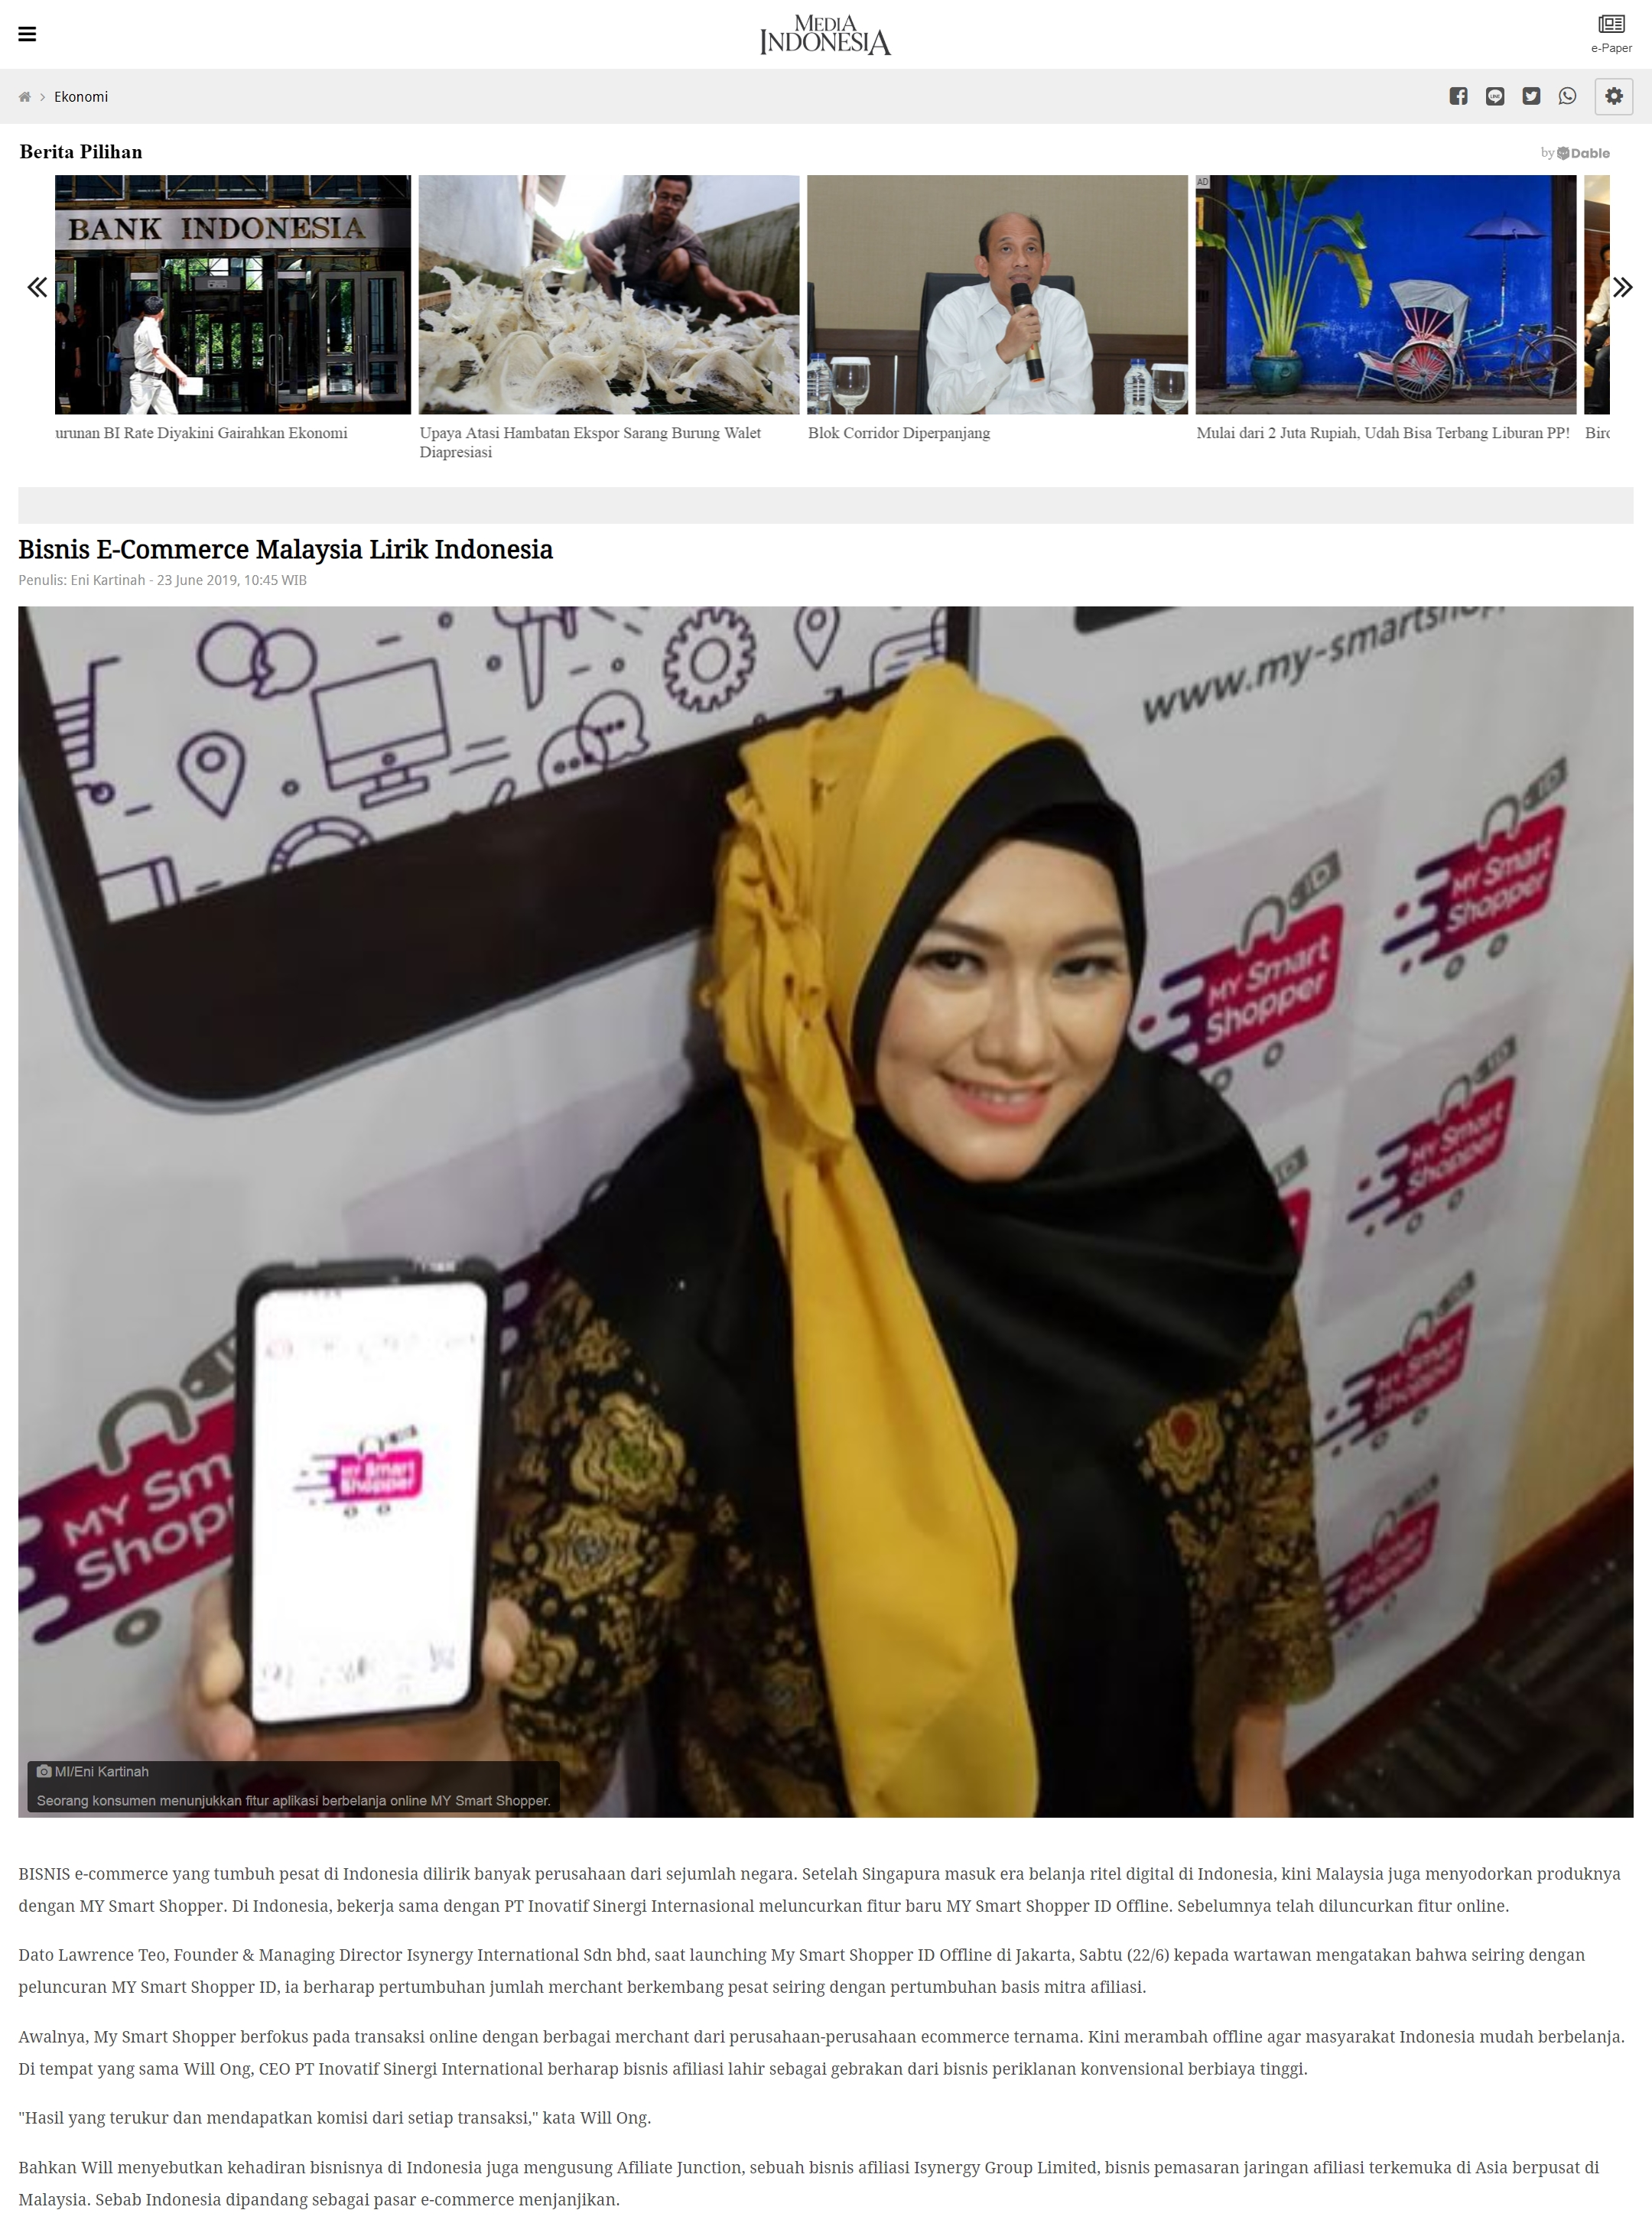 MediaIndonesia_BisnisECommerceMalaysiaLirikIndonesia_23June2019